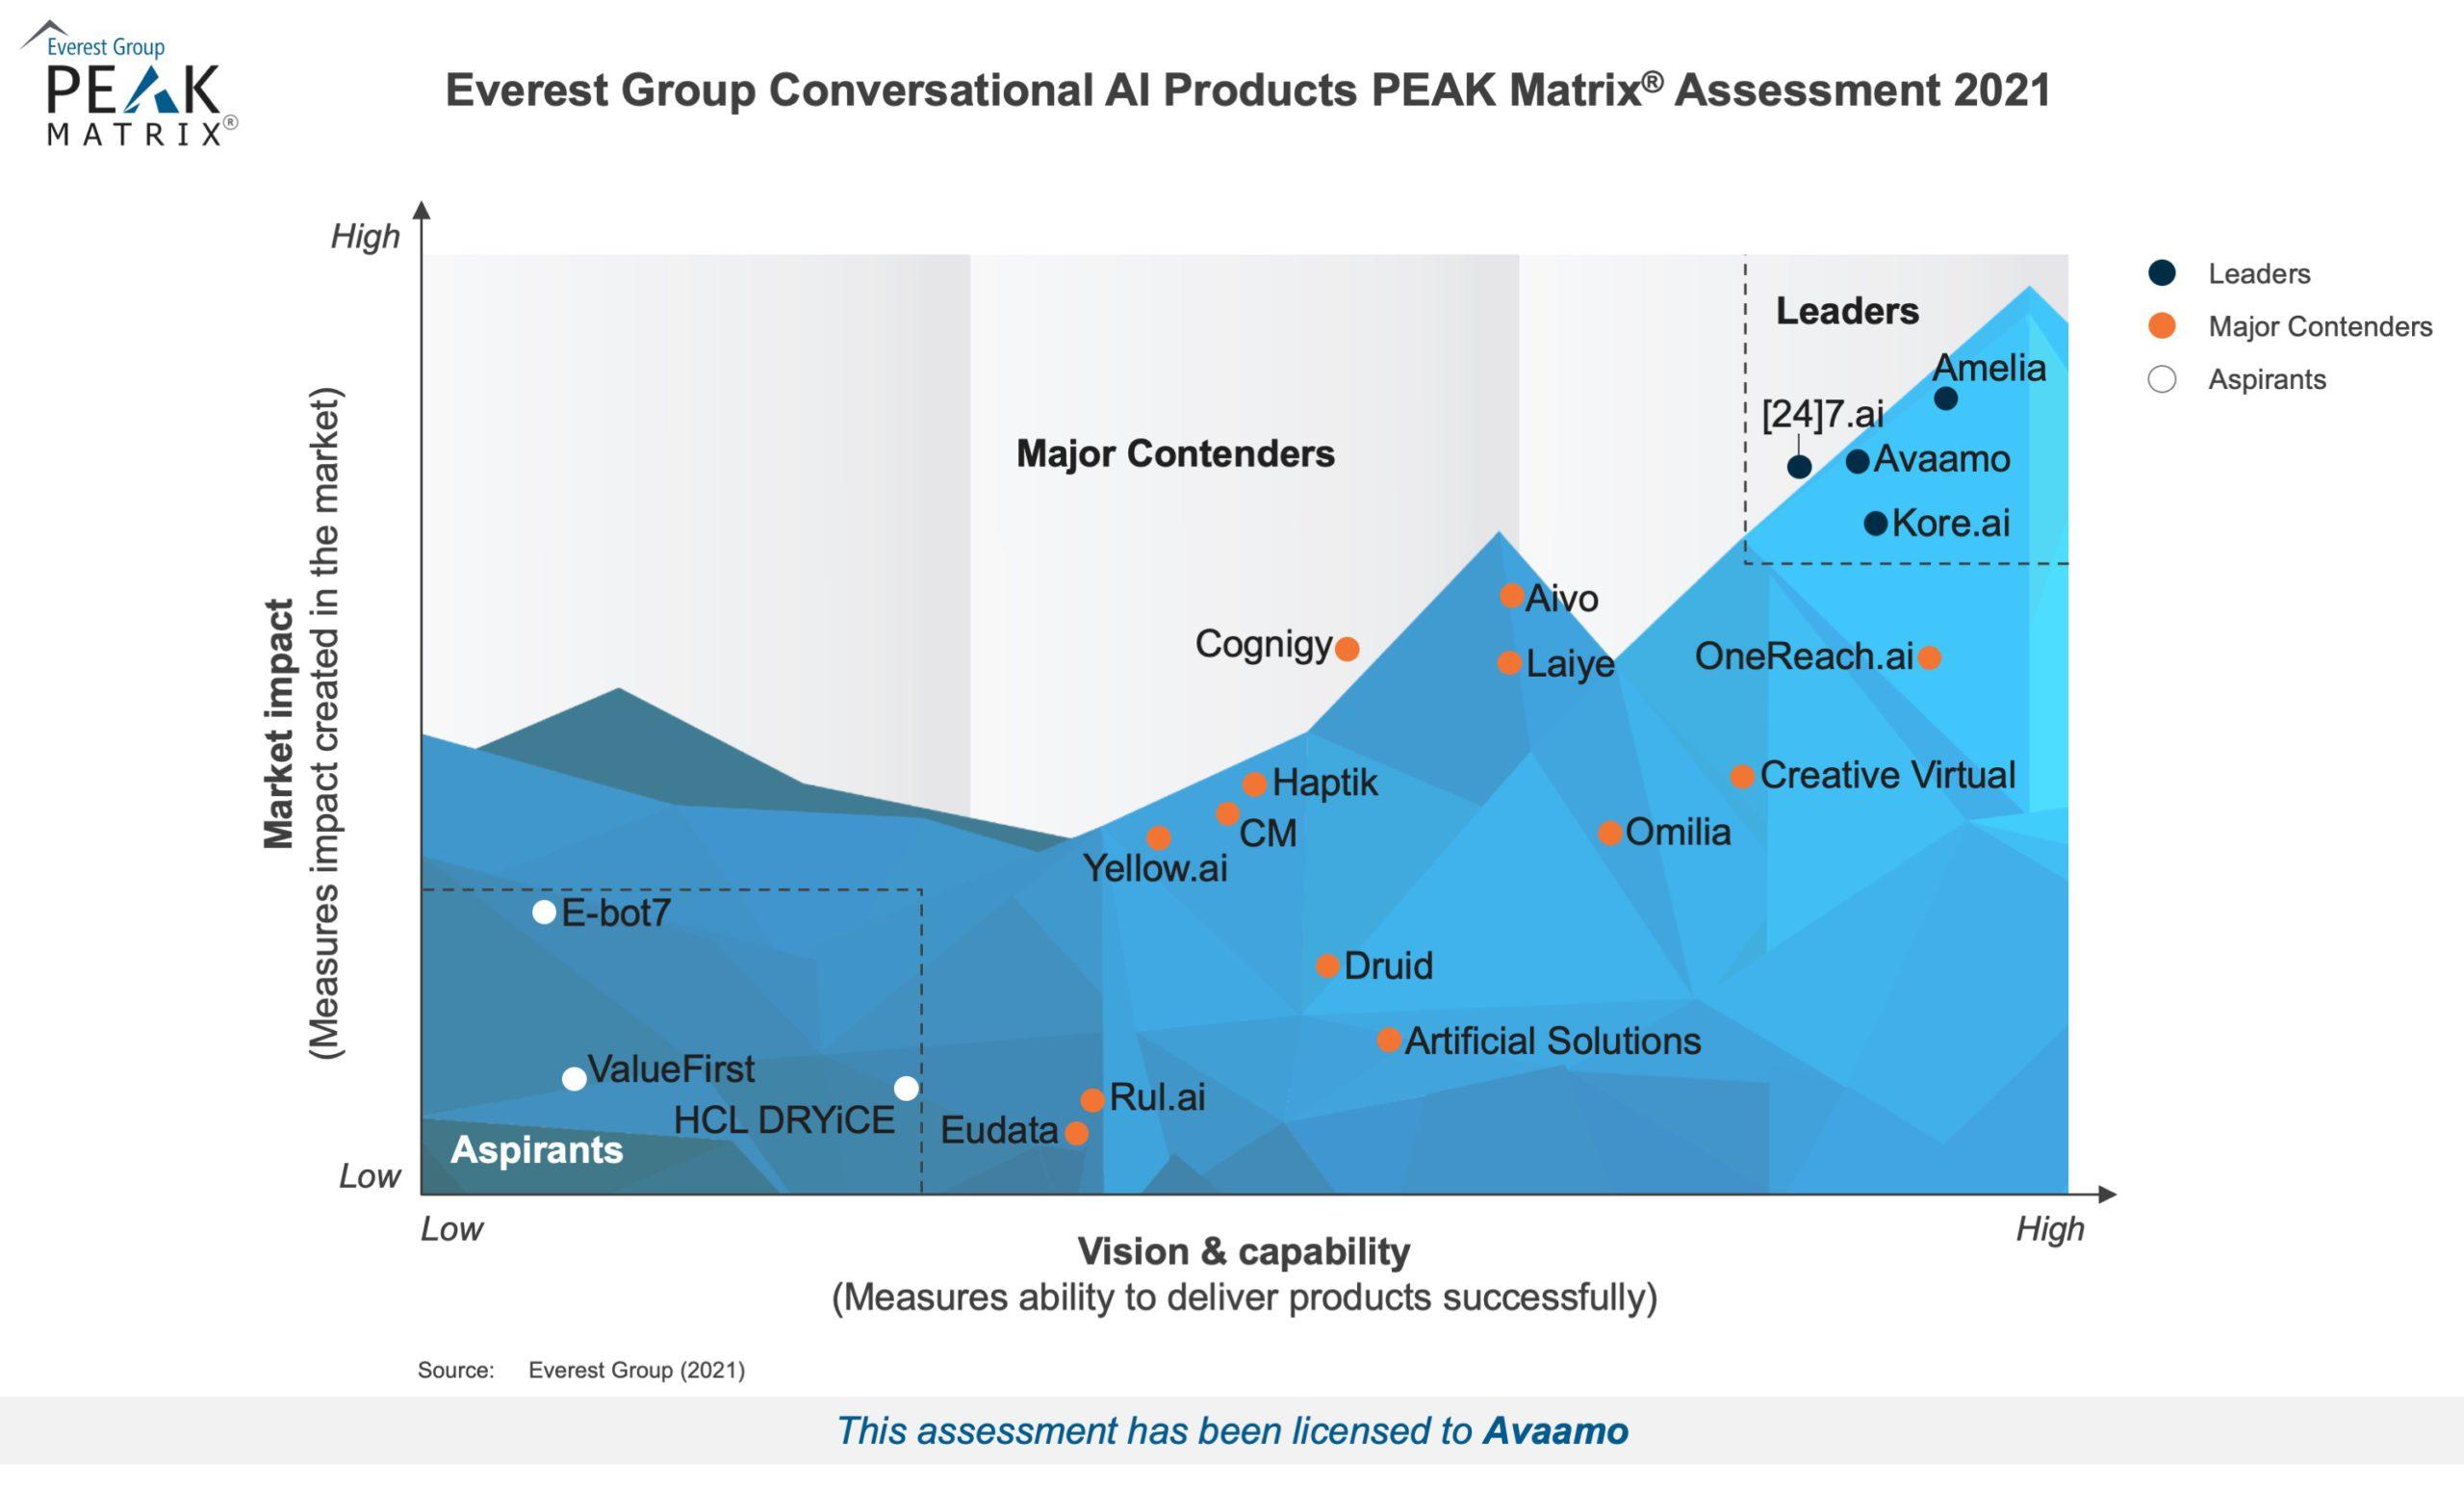 Everest Group Conversational AI Products PEAK Matrix® Assessment 2021 Avaamo